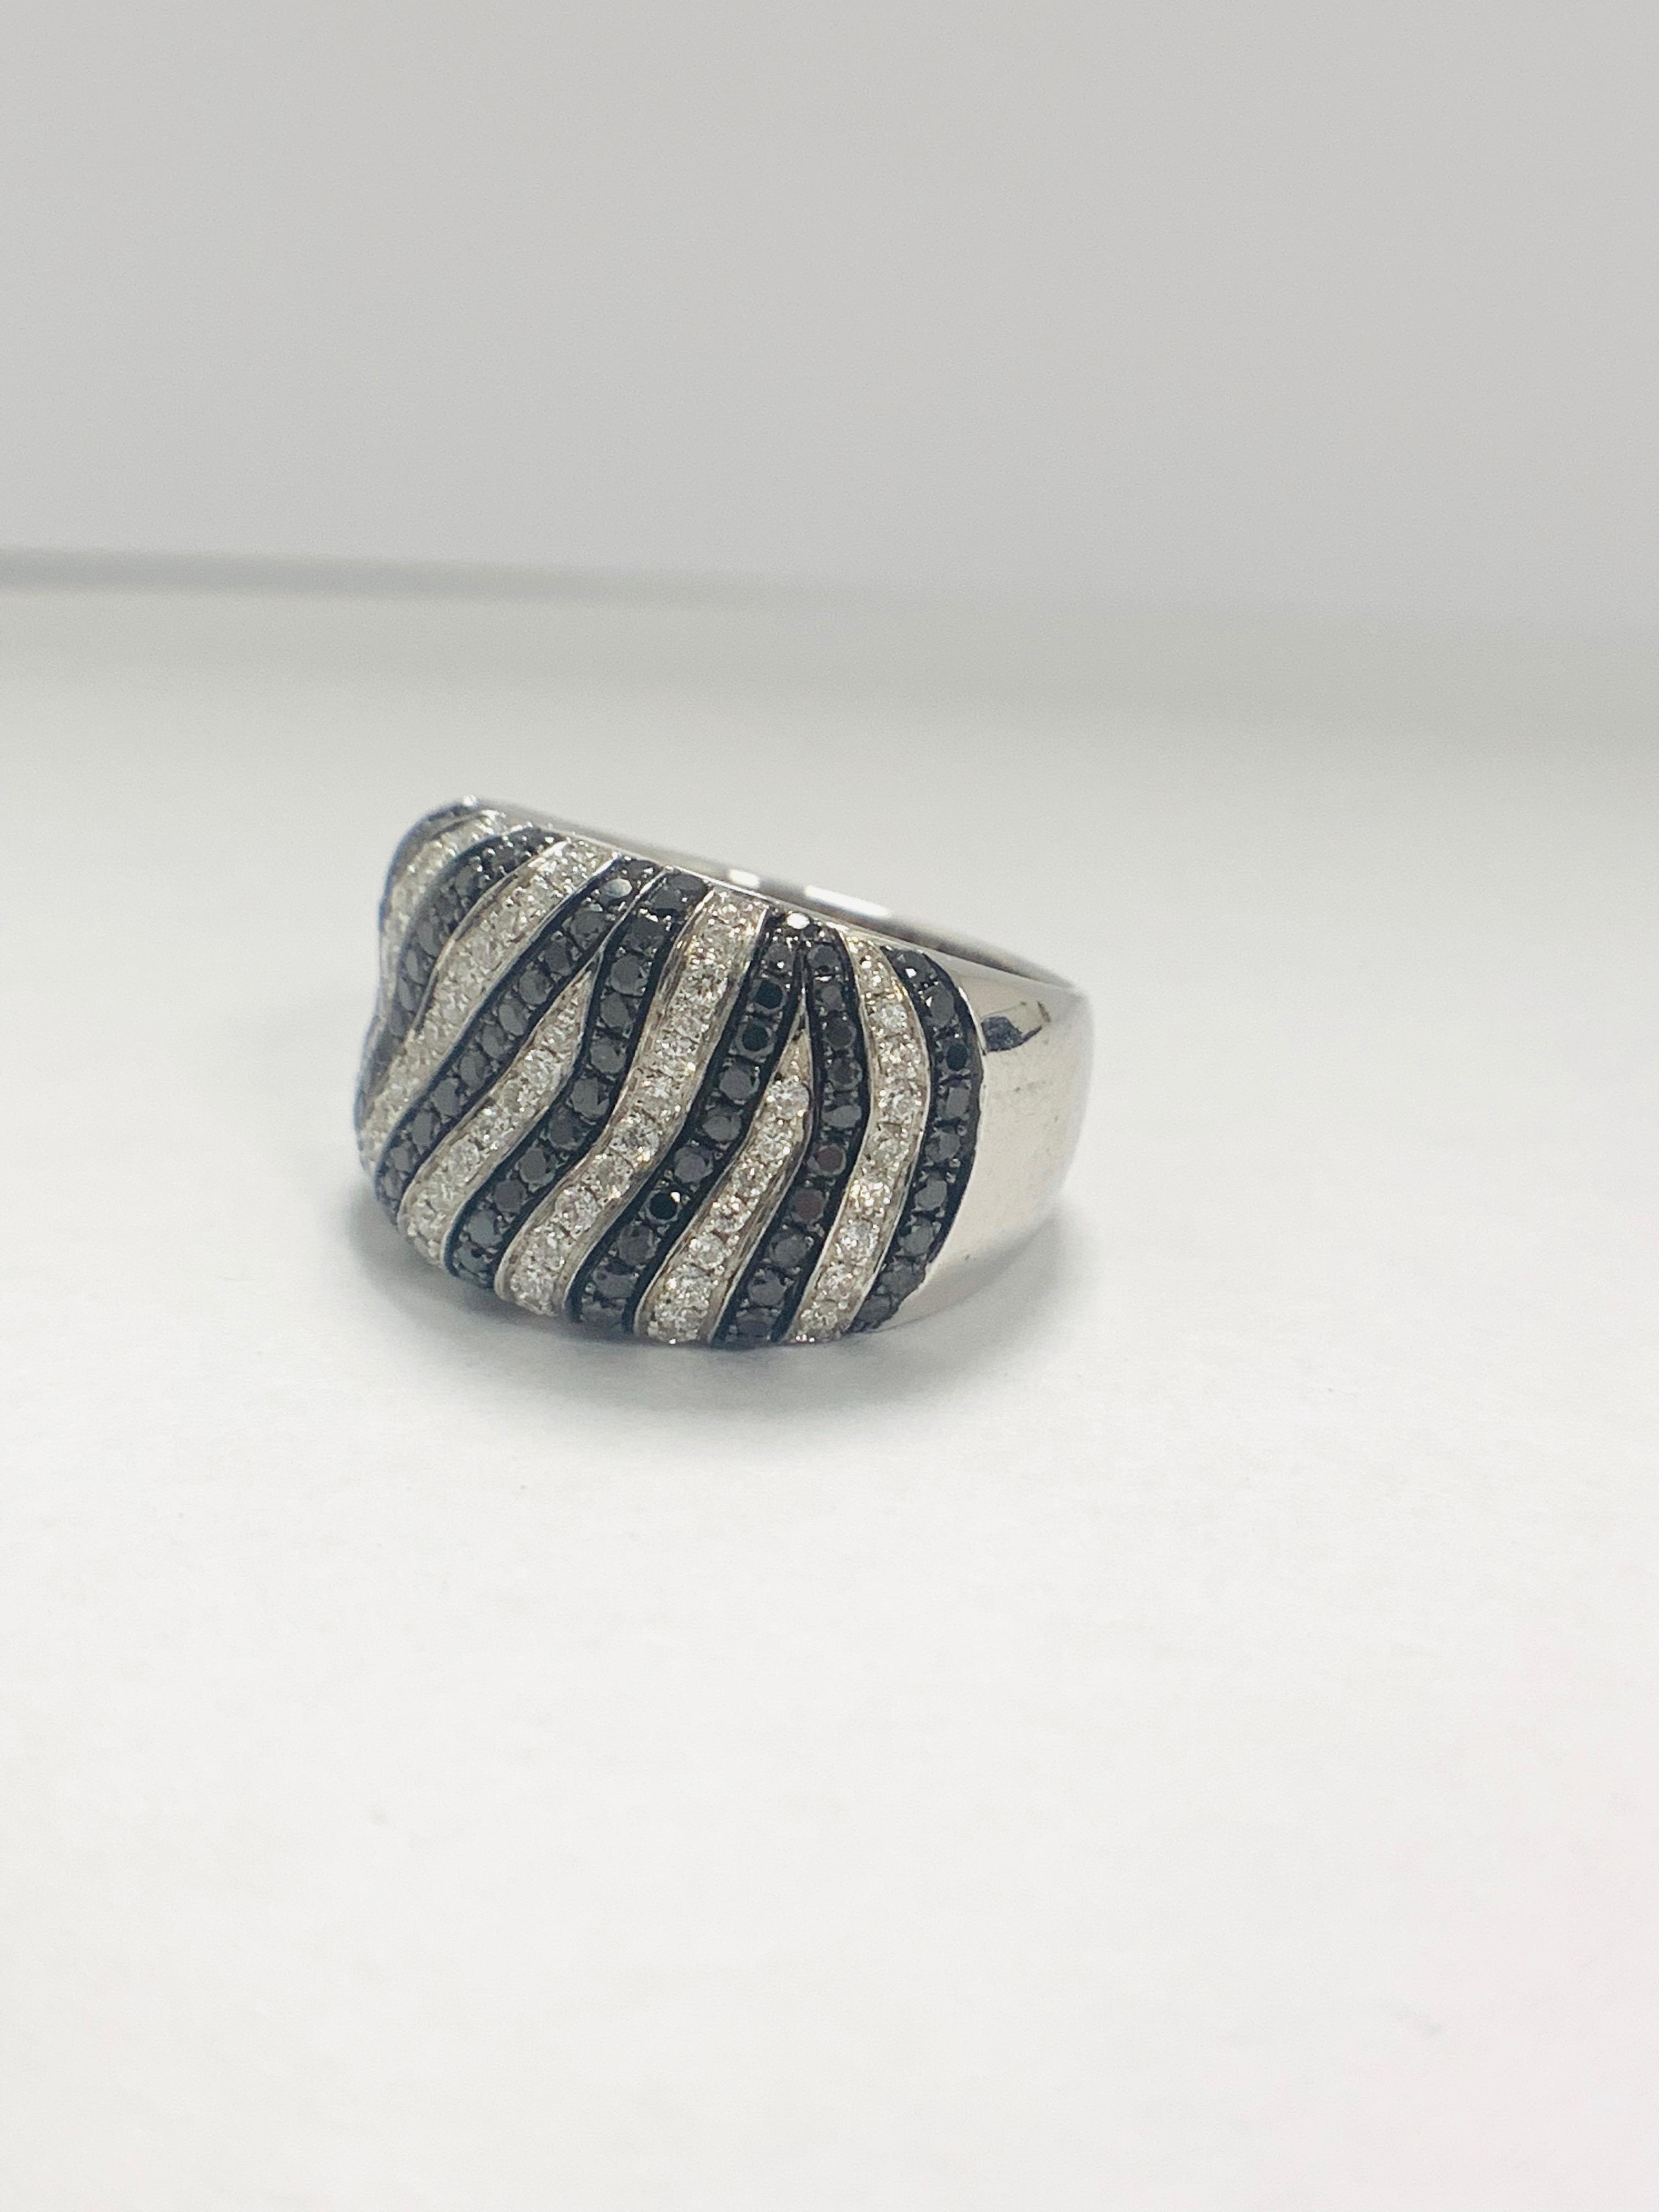 18ct White Gold Diamond ring - Image 2 of 14